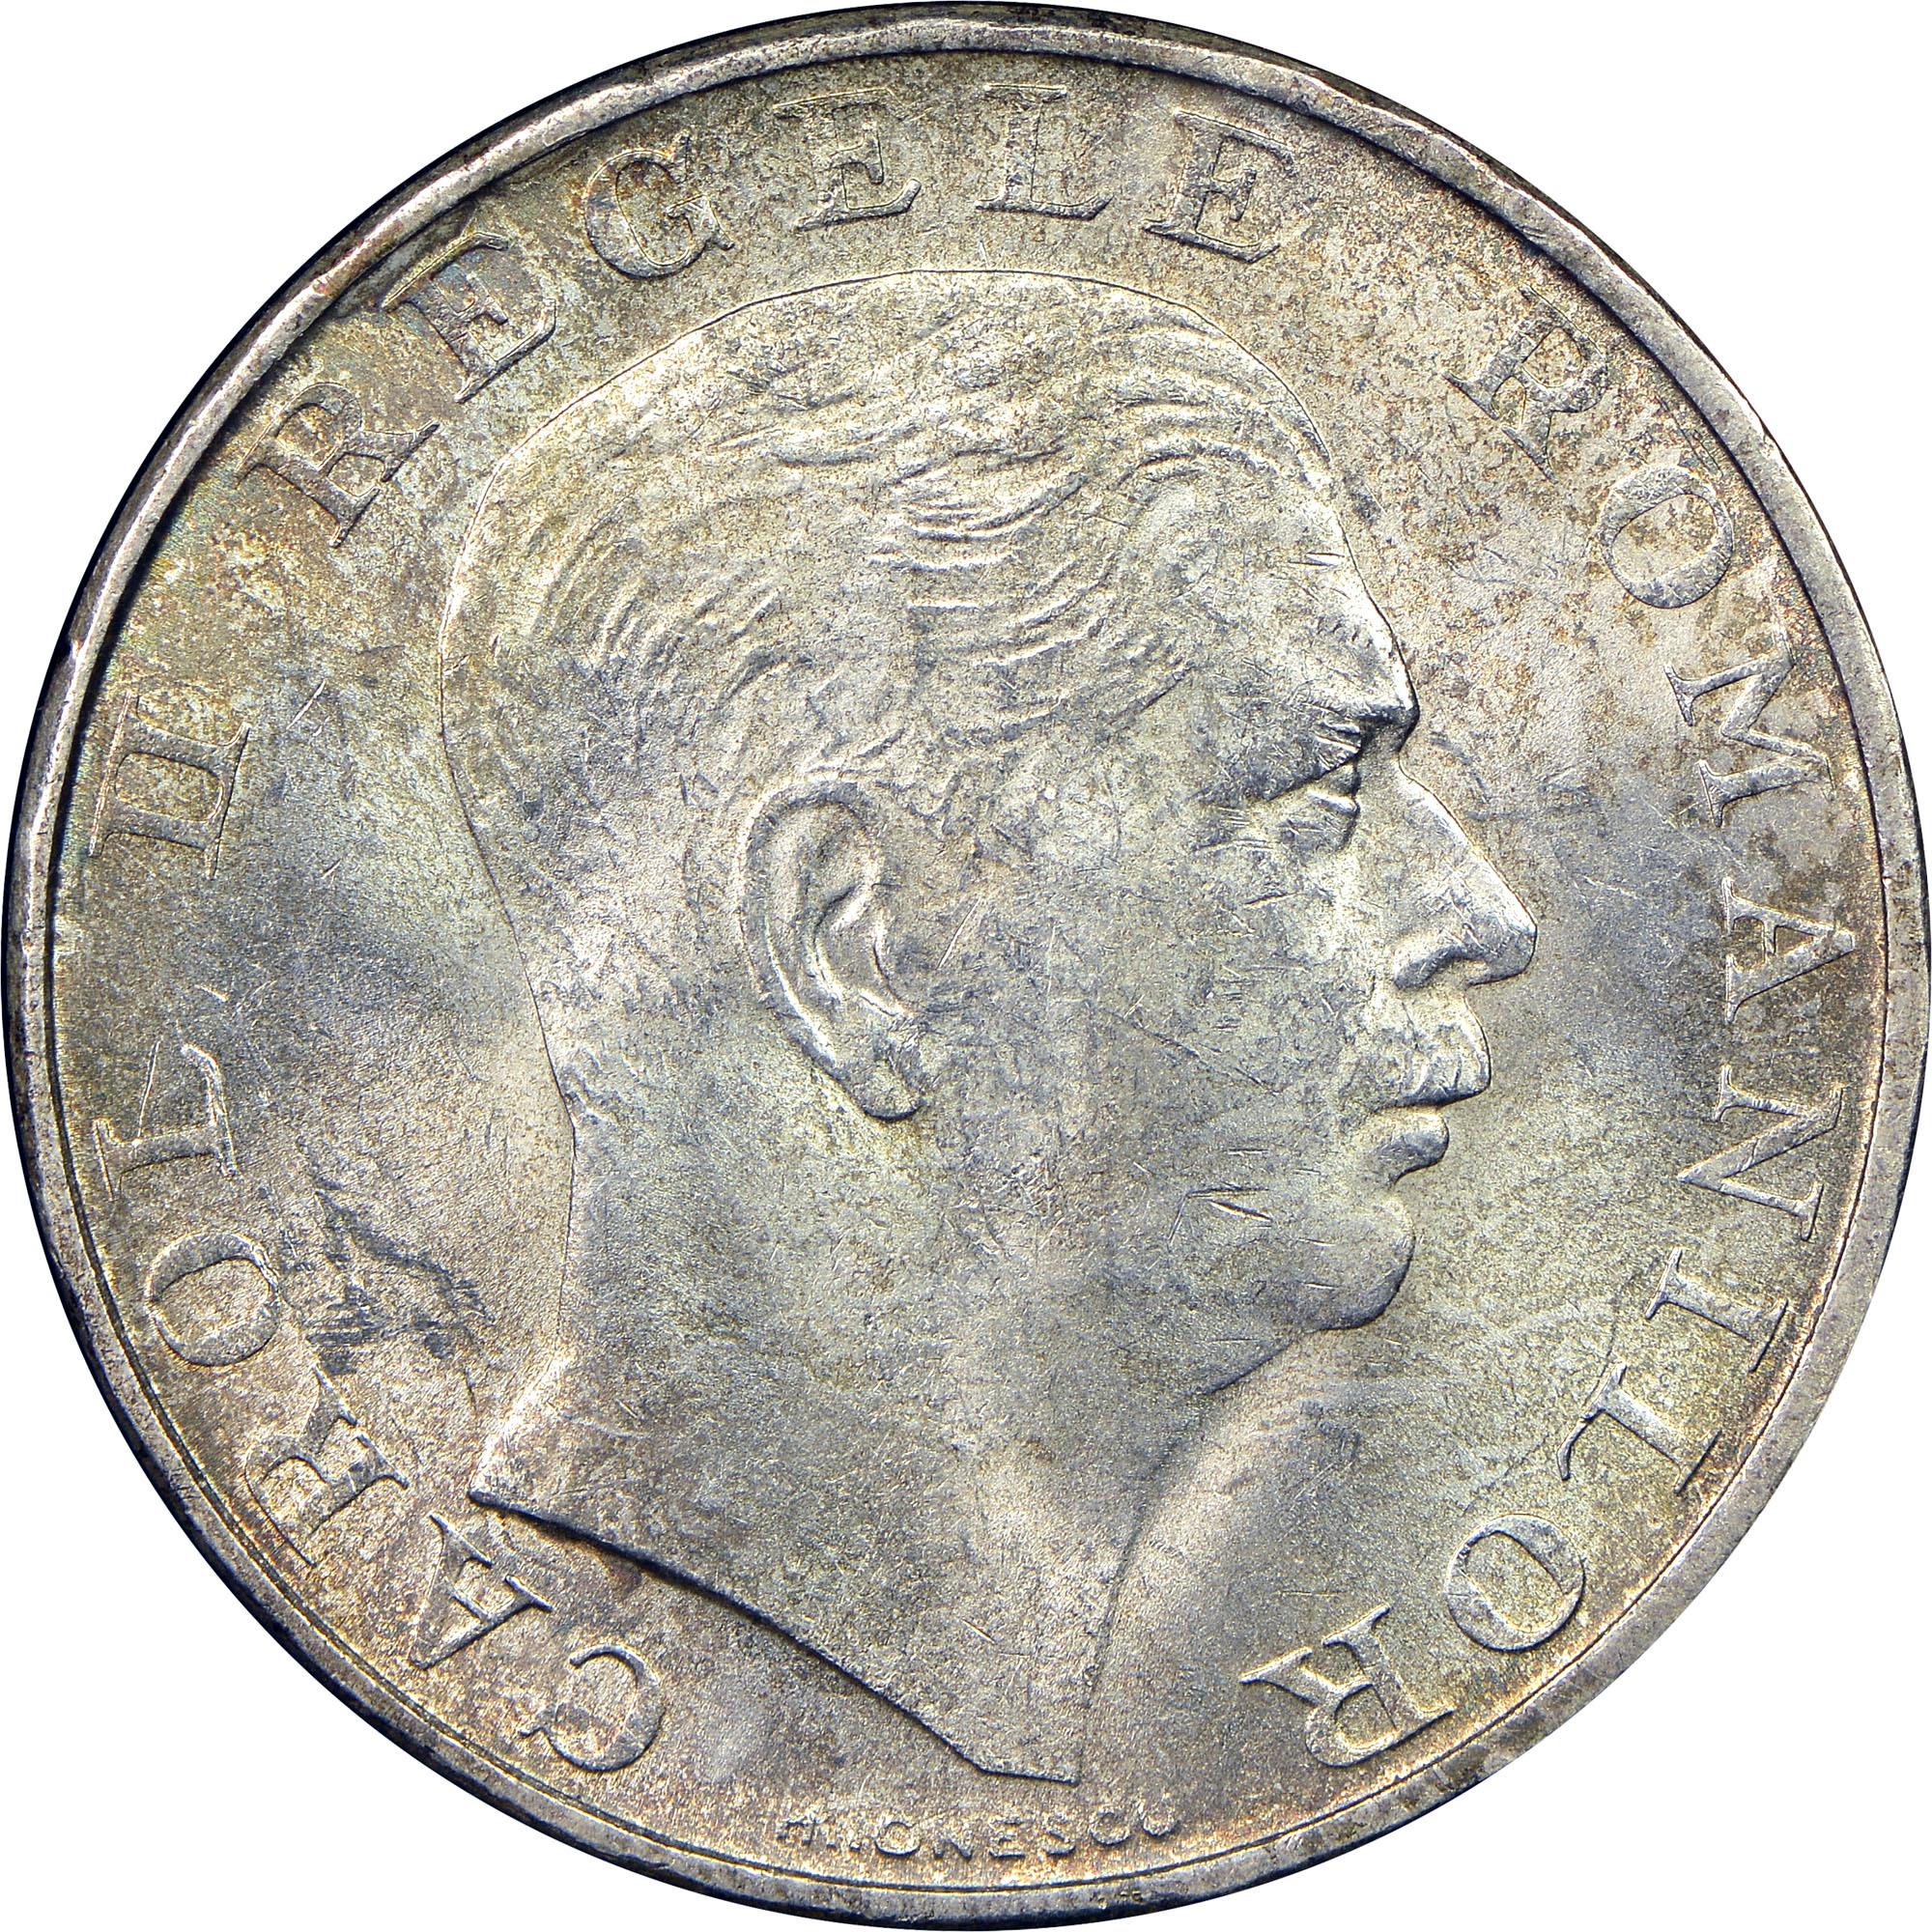 Dtrc Coin Value Finder